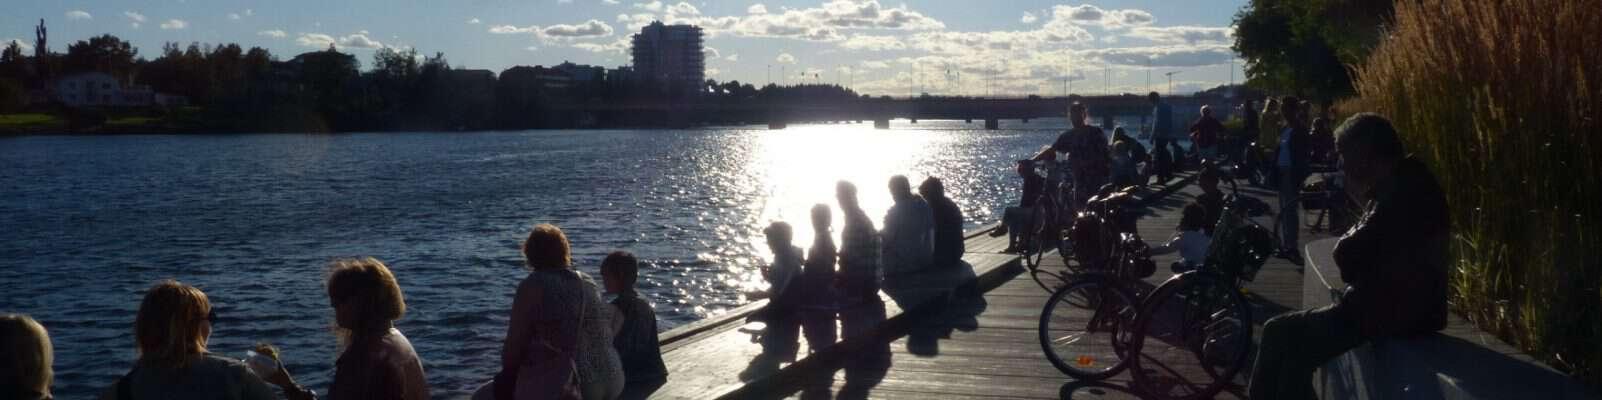 Open water-tävlingen mitt i Umeå